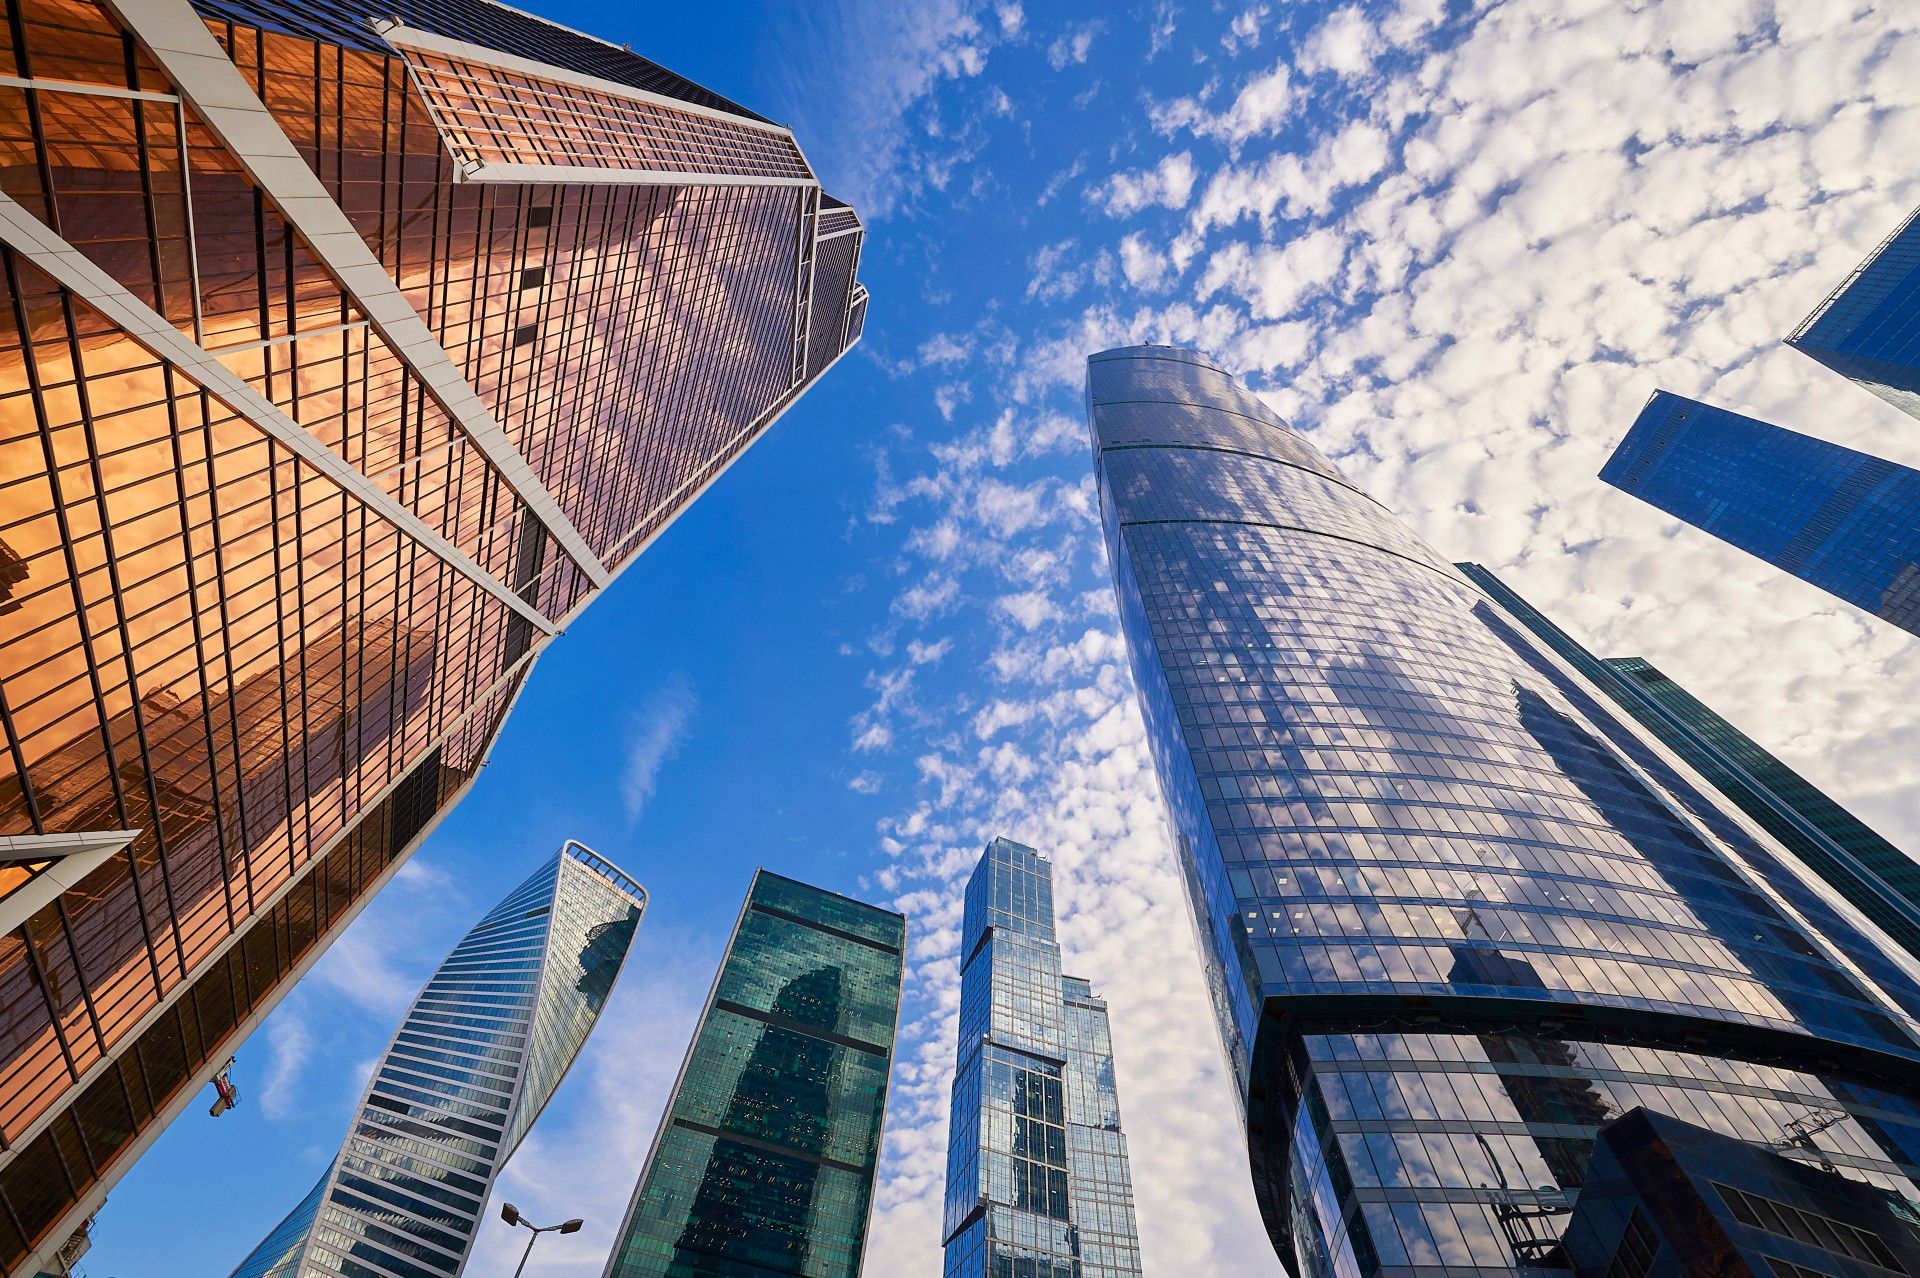 Экскурсия на смотровую площадку «Москва-Сити» фото 1